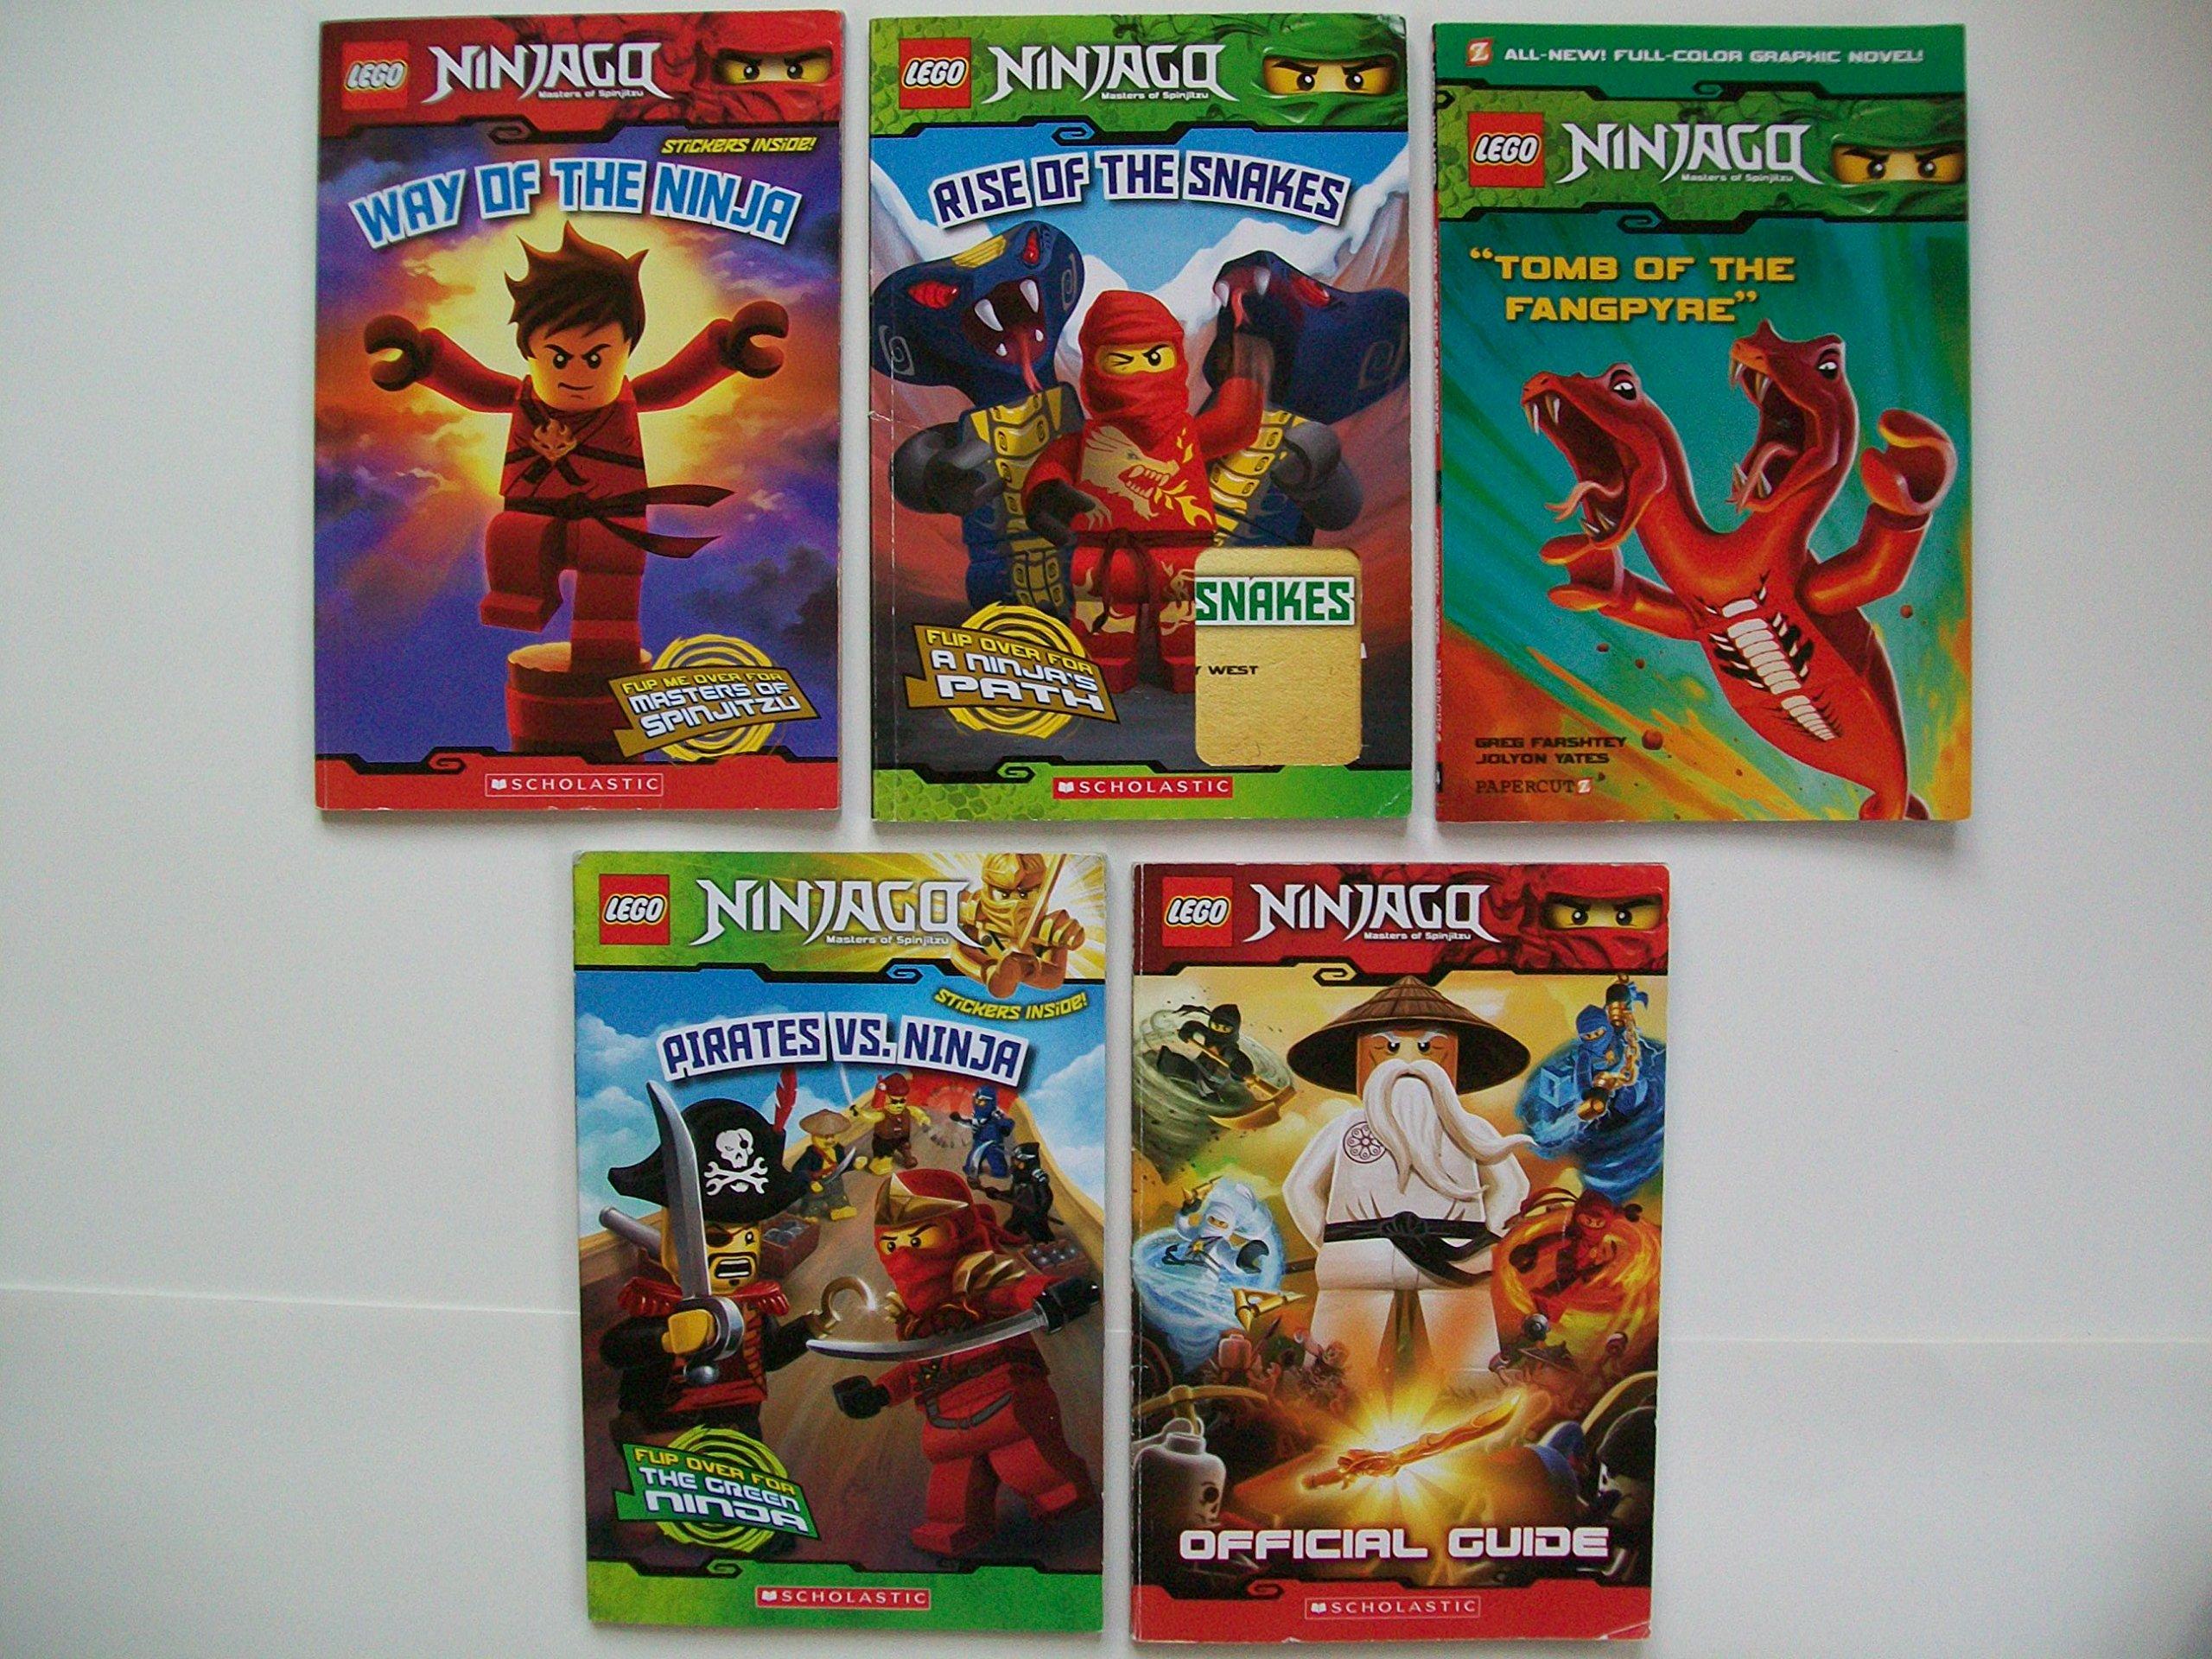 Ninjago (Set of 5) Way of Ninja; Rise of Snakes; Tomb of ...